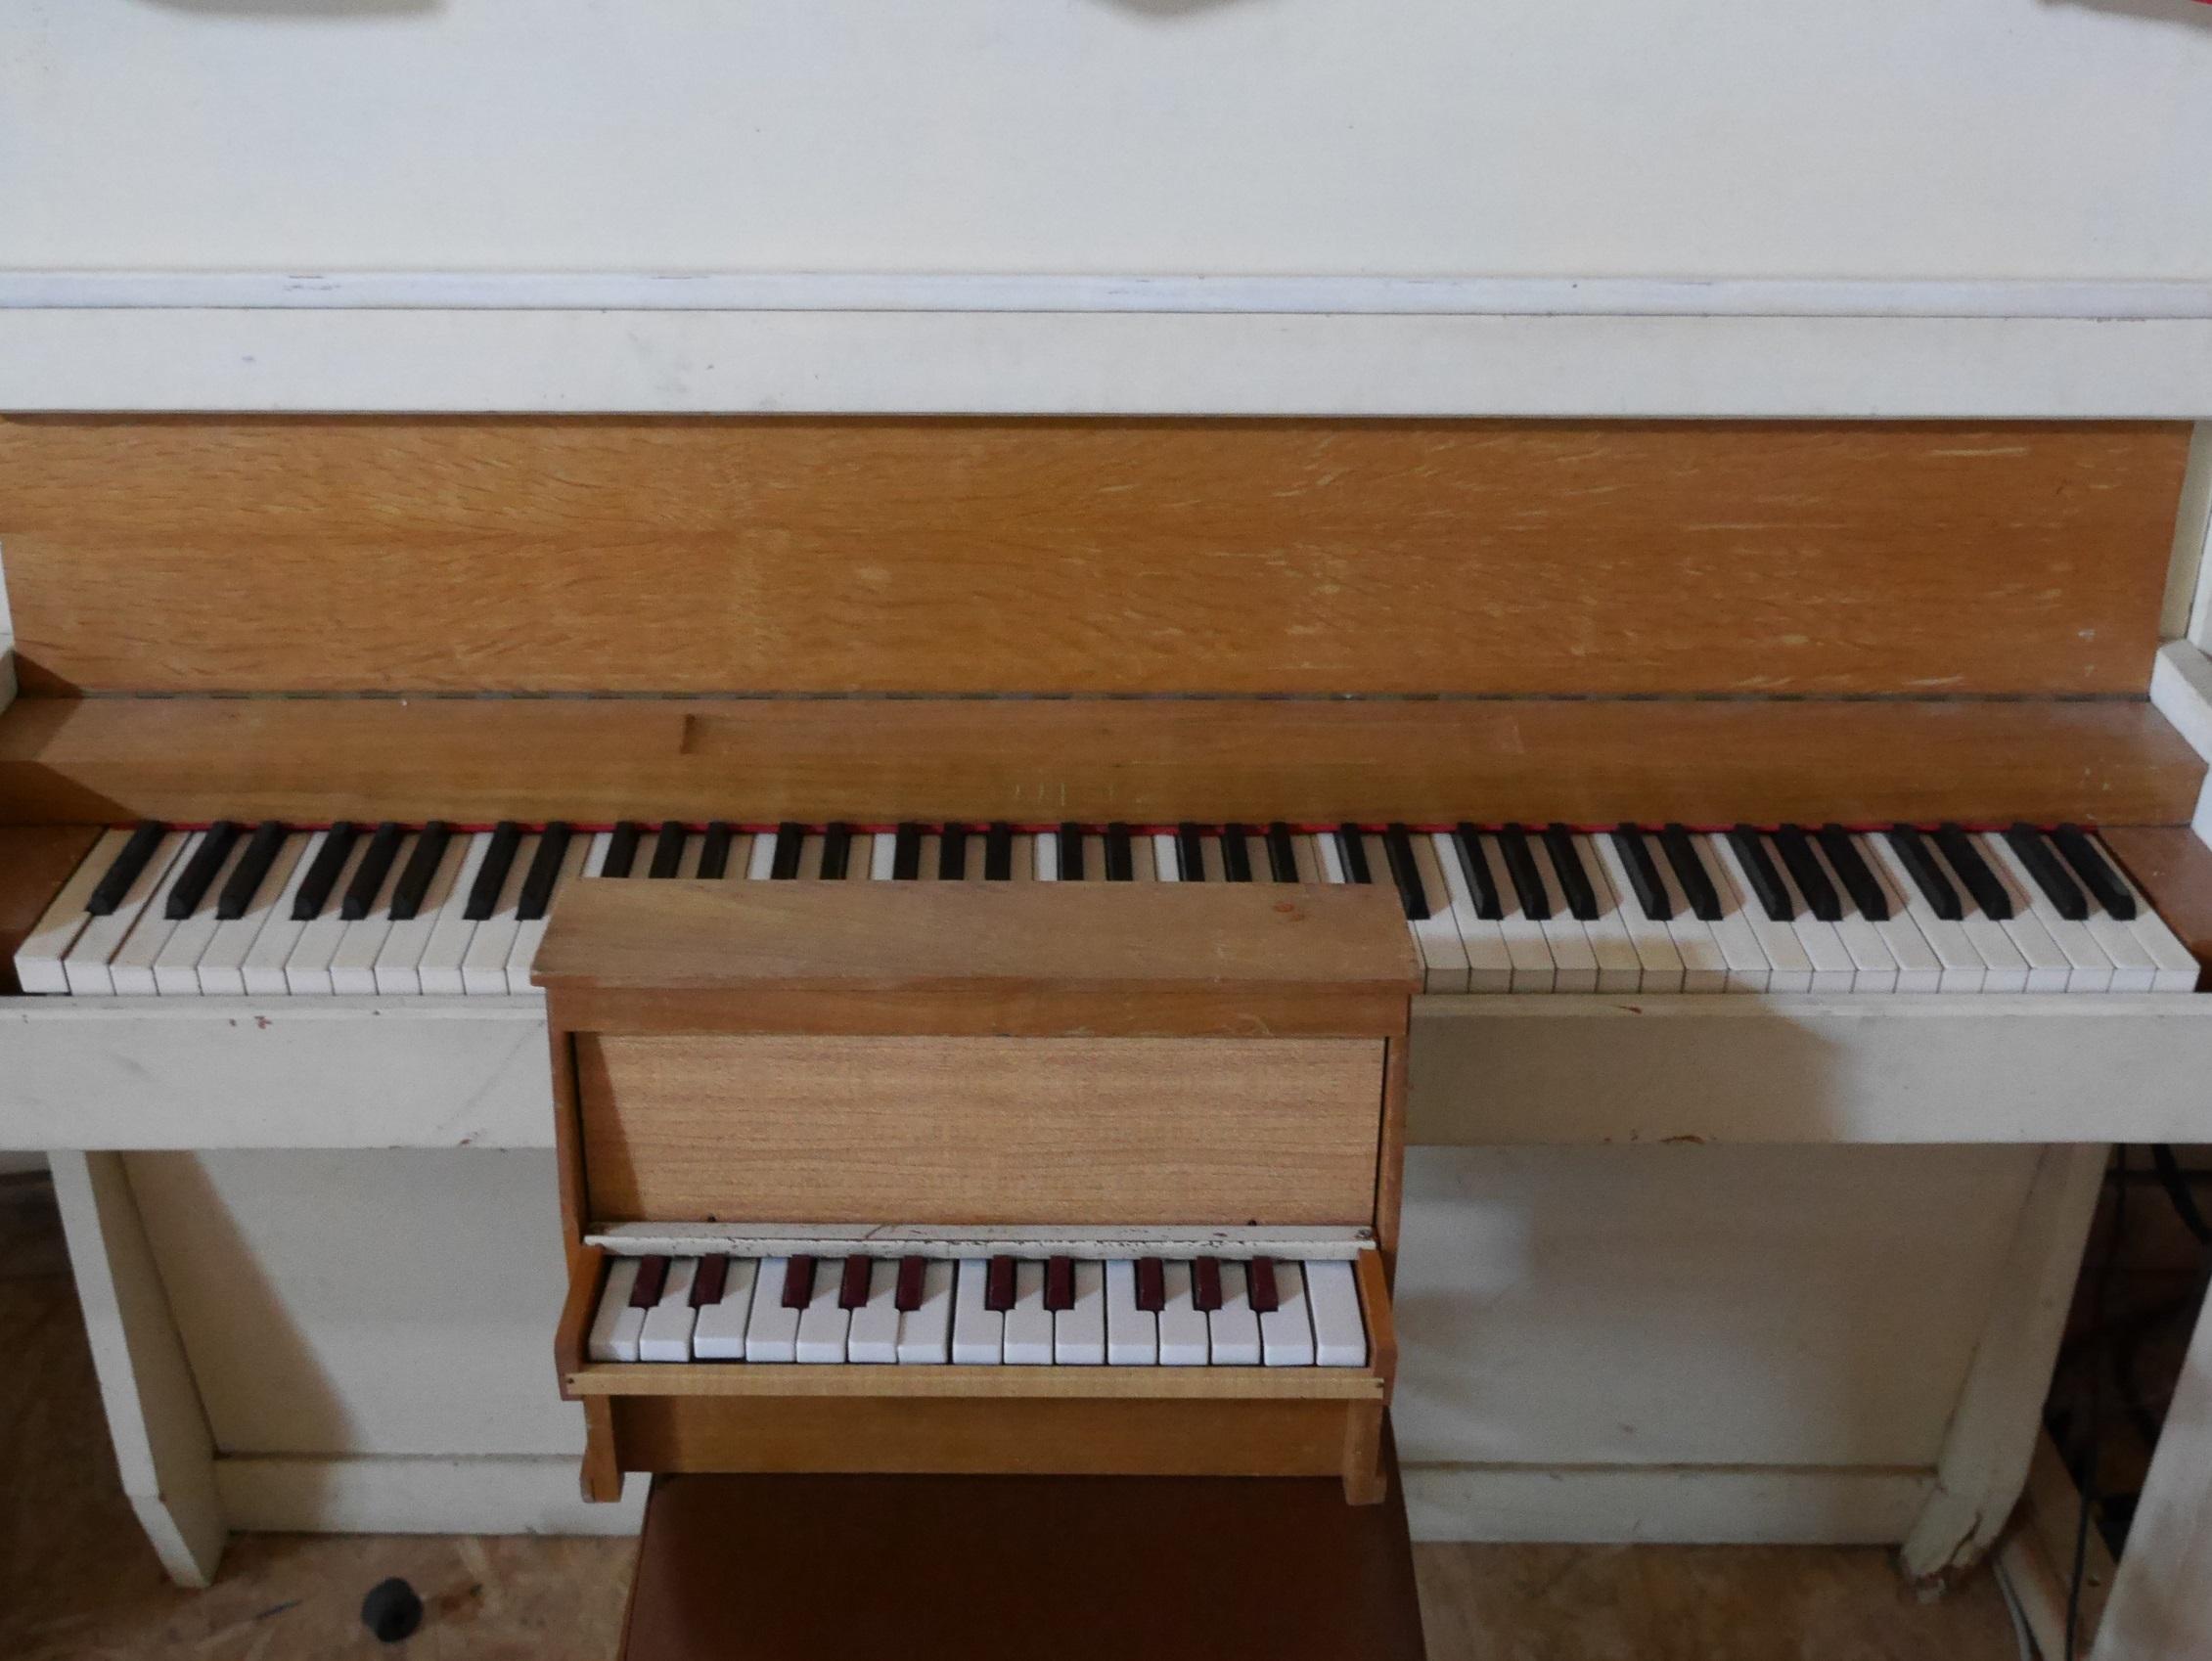 studio la boite a meuh - toy piano Michelsonne